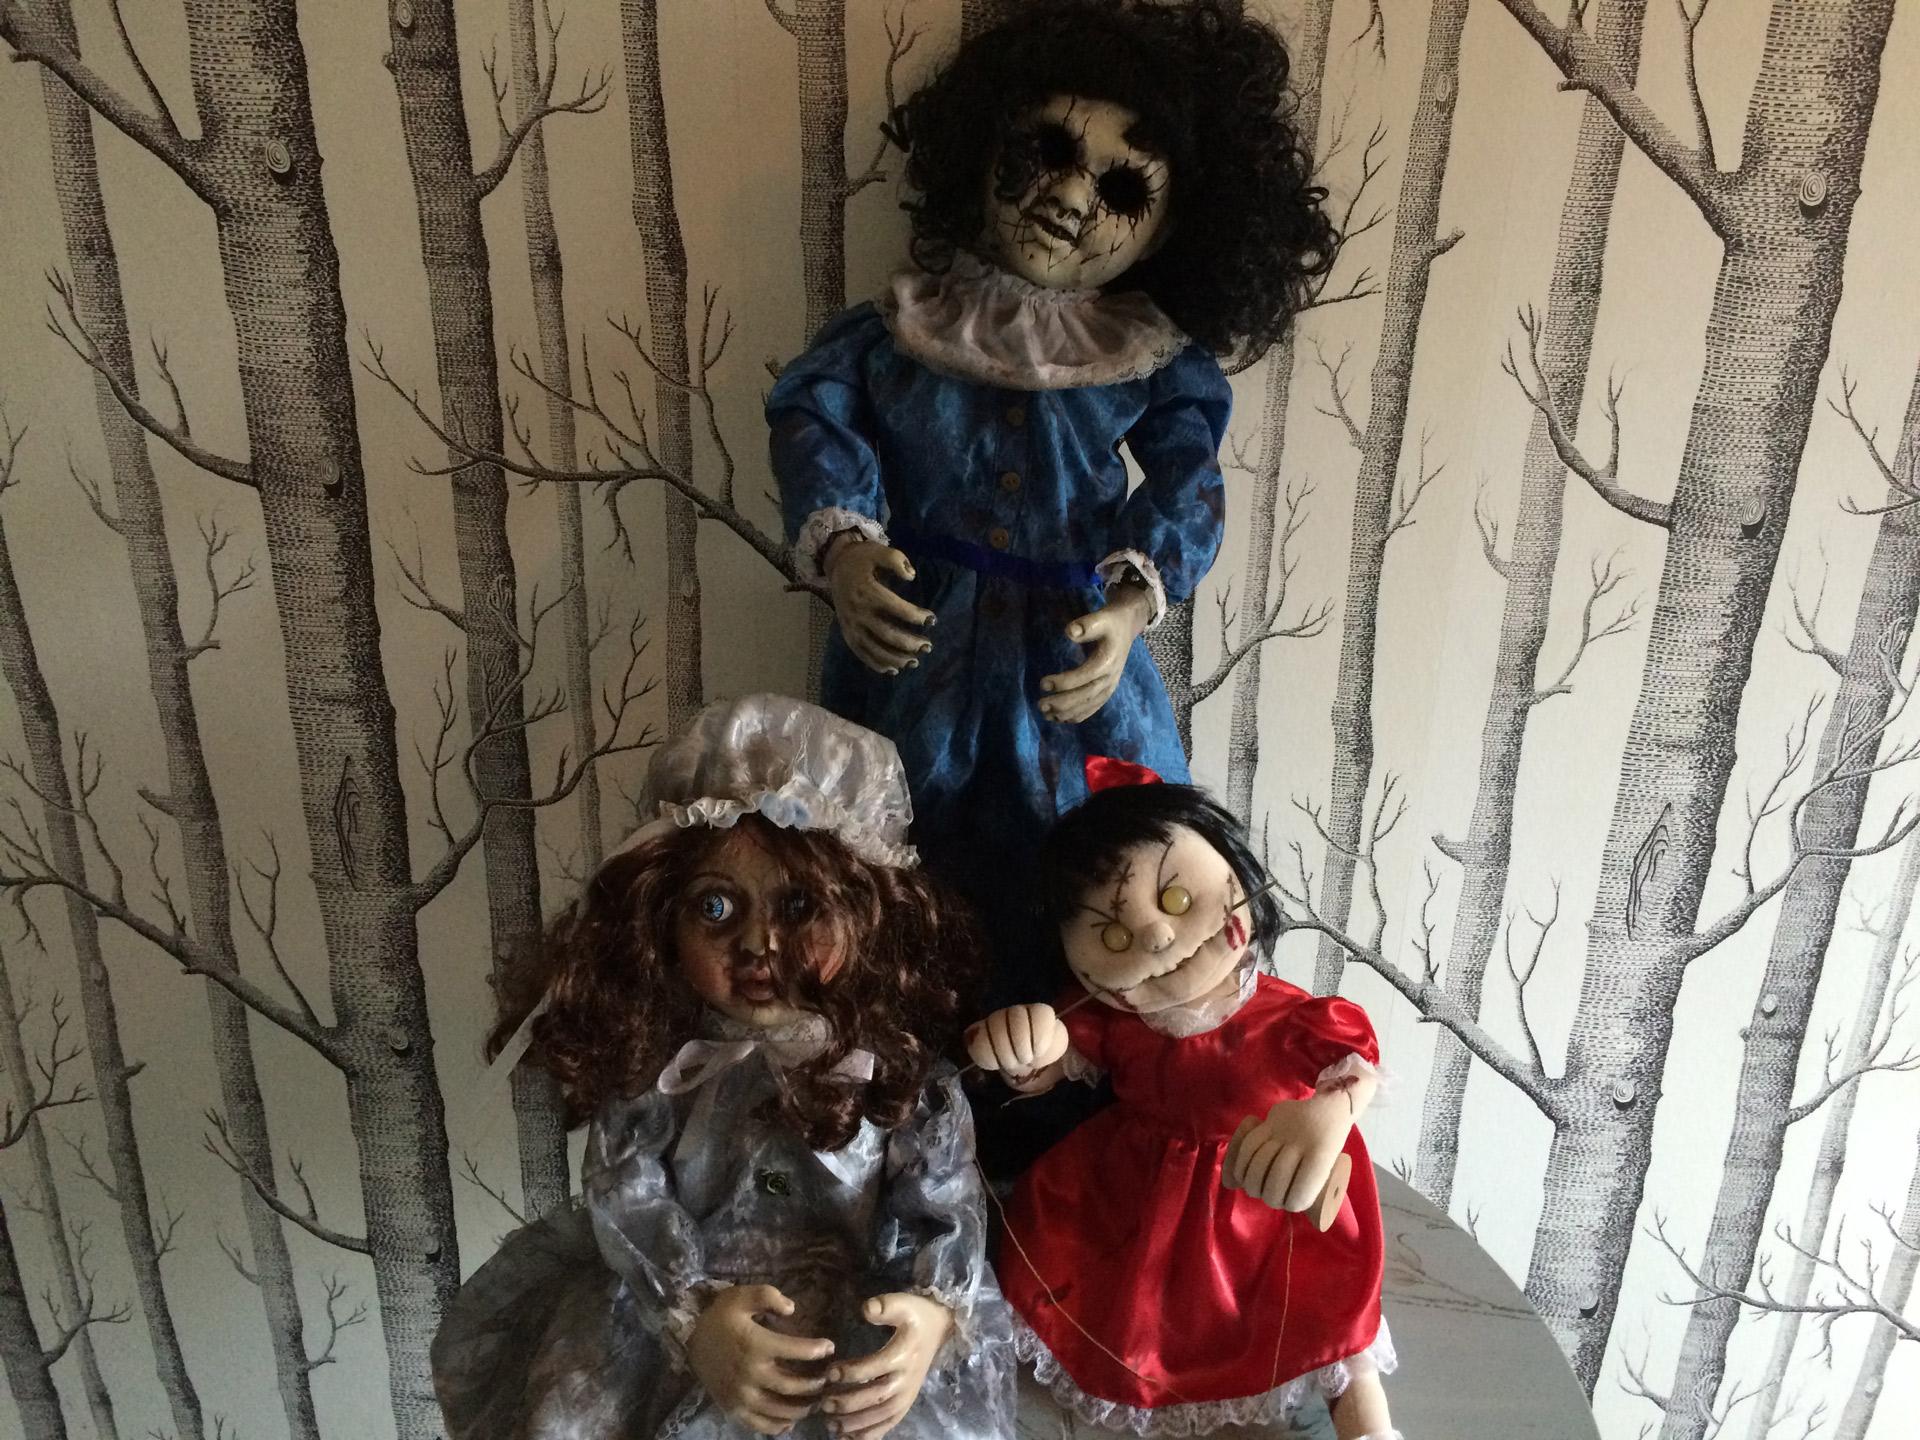 Scary dolls | Sheknows.com